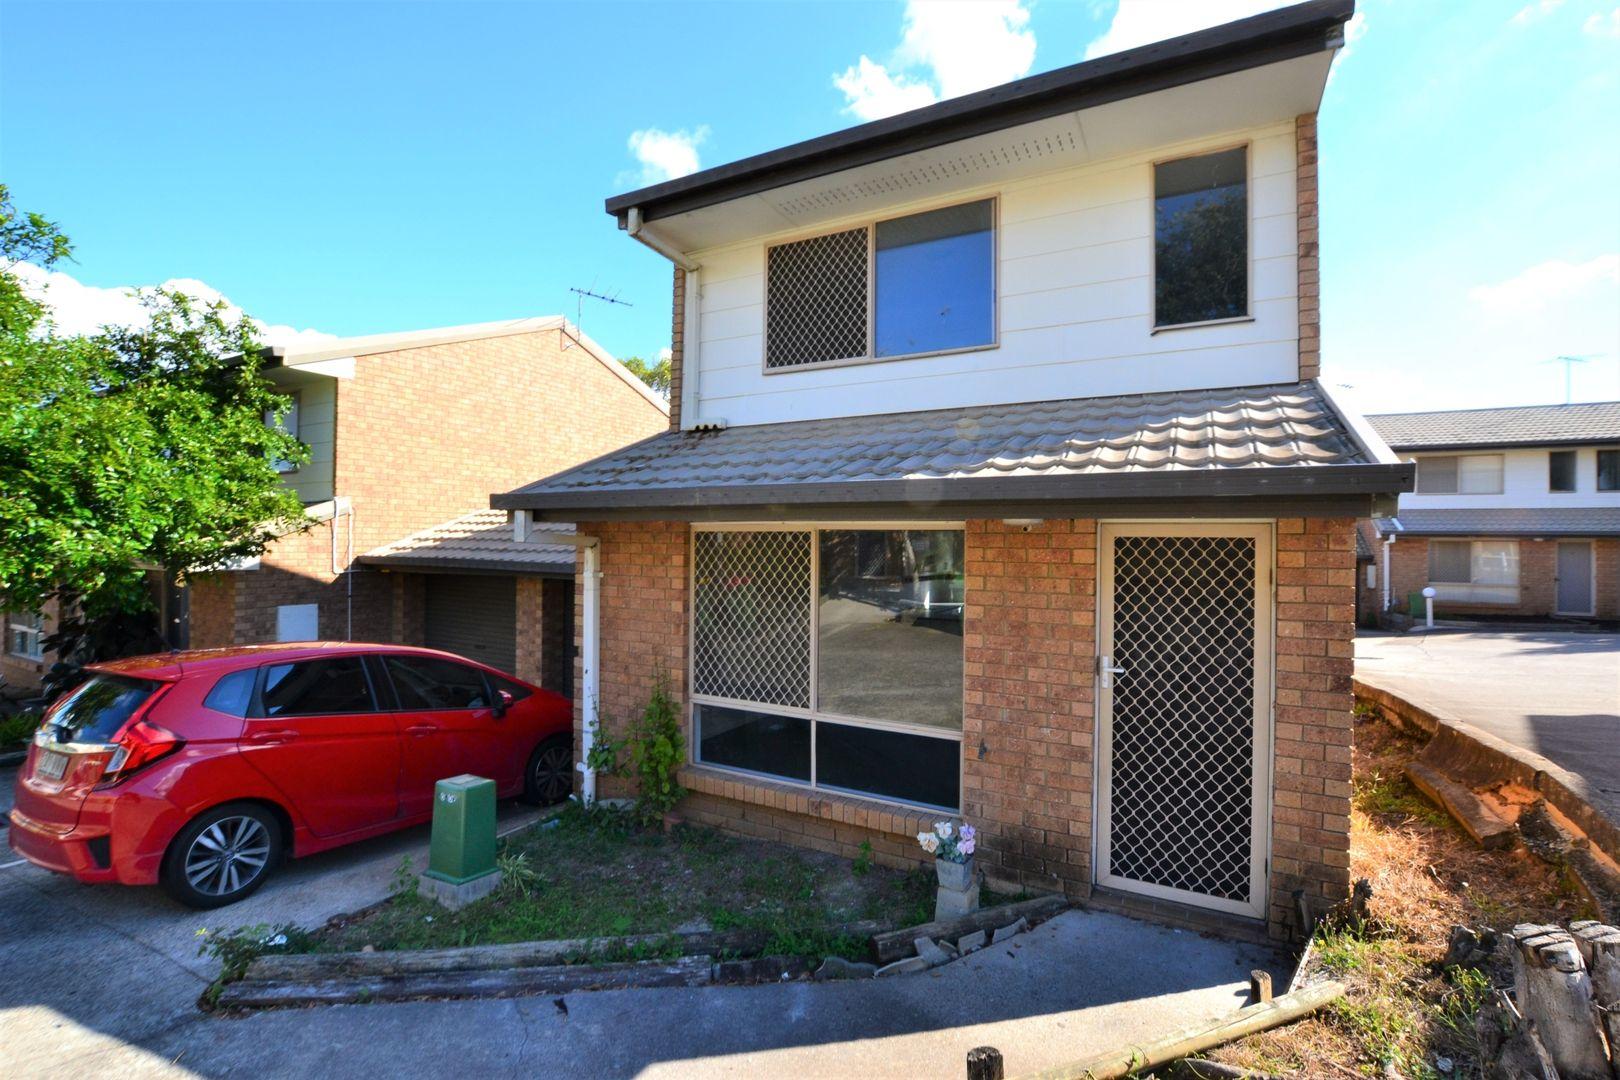 14/96 Smith Road, Woodridge QLD 4114, Image 1